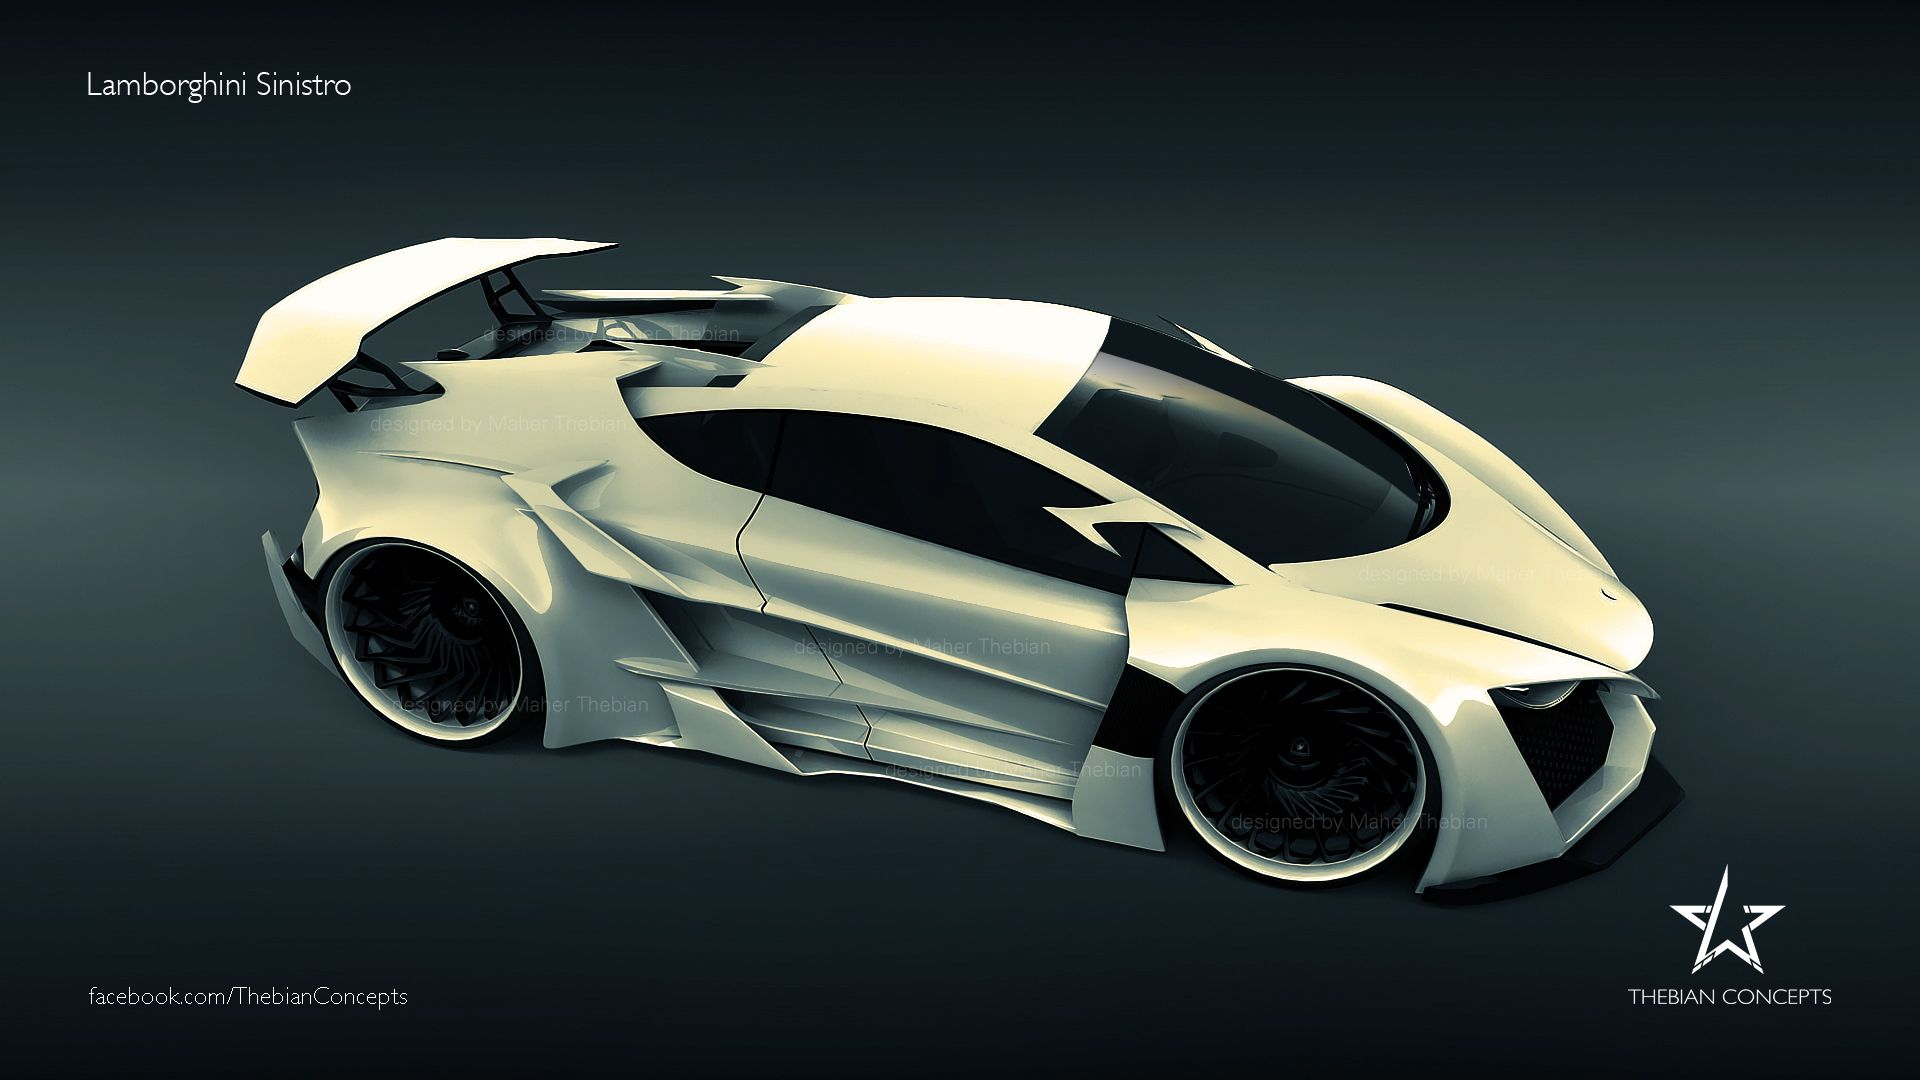 Lovely Vehicles   Lamborghini Sinistro   Maher Thebian   Sinistro   Lamborghini  Concept   Thebian Concepts Wallpaper Ideas